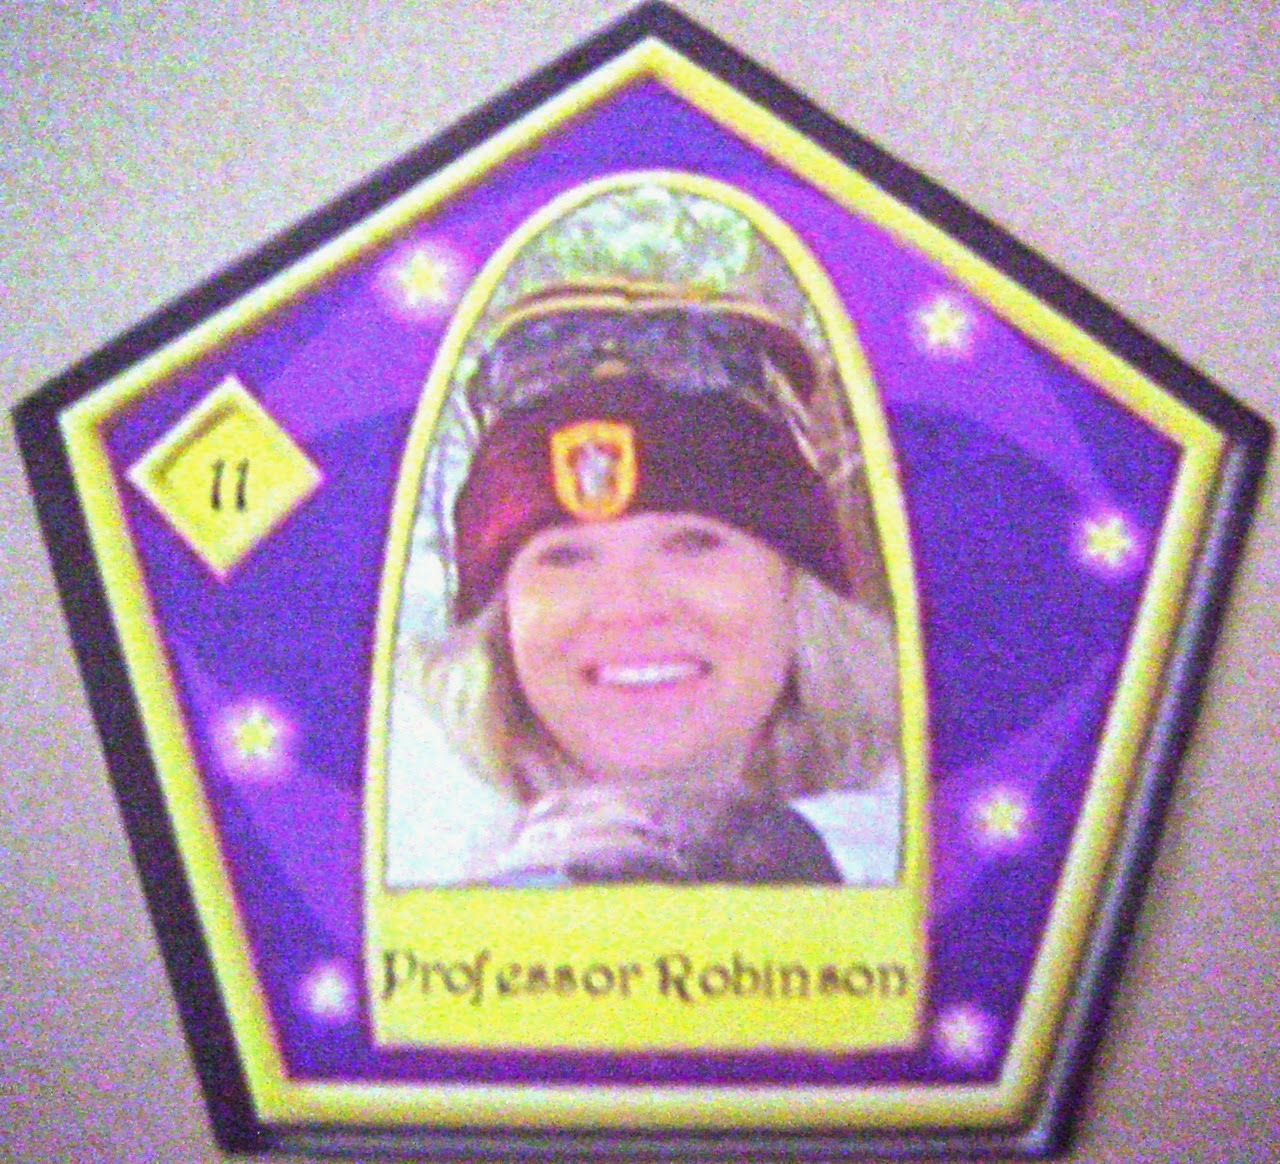 Professor Robinson